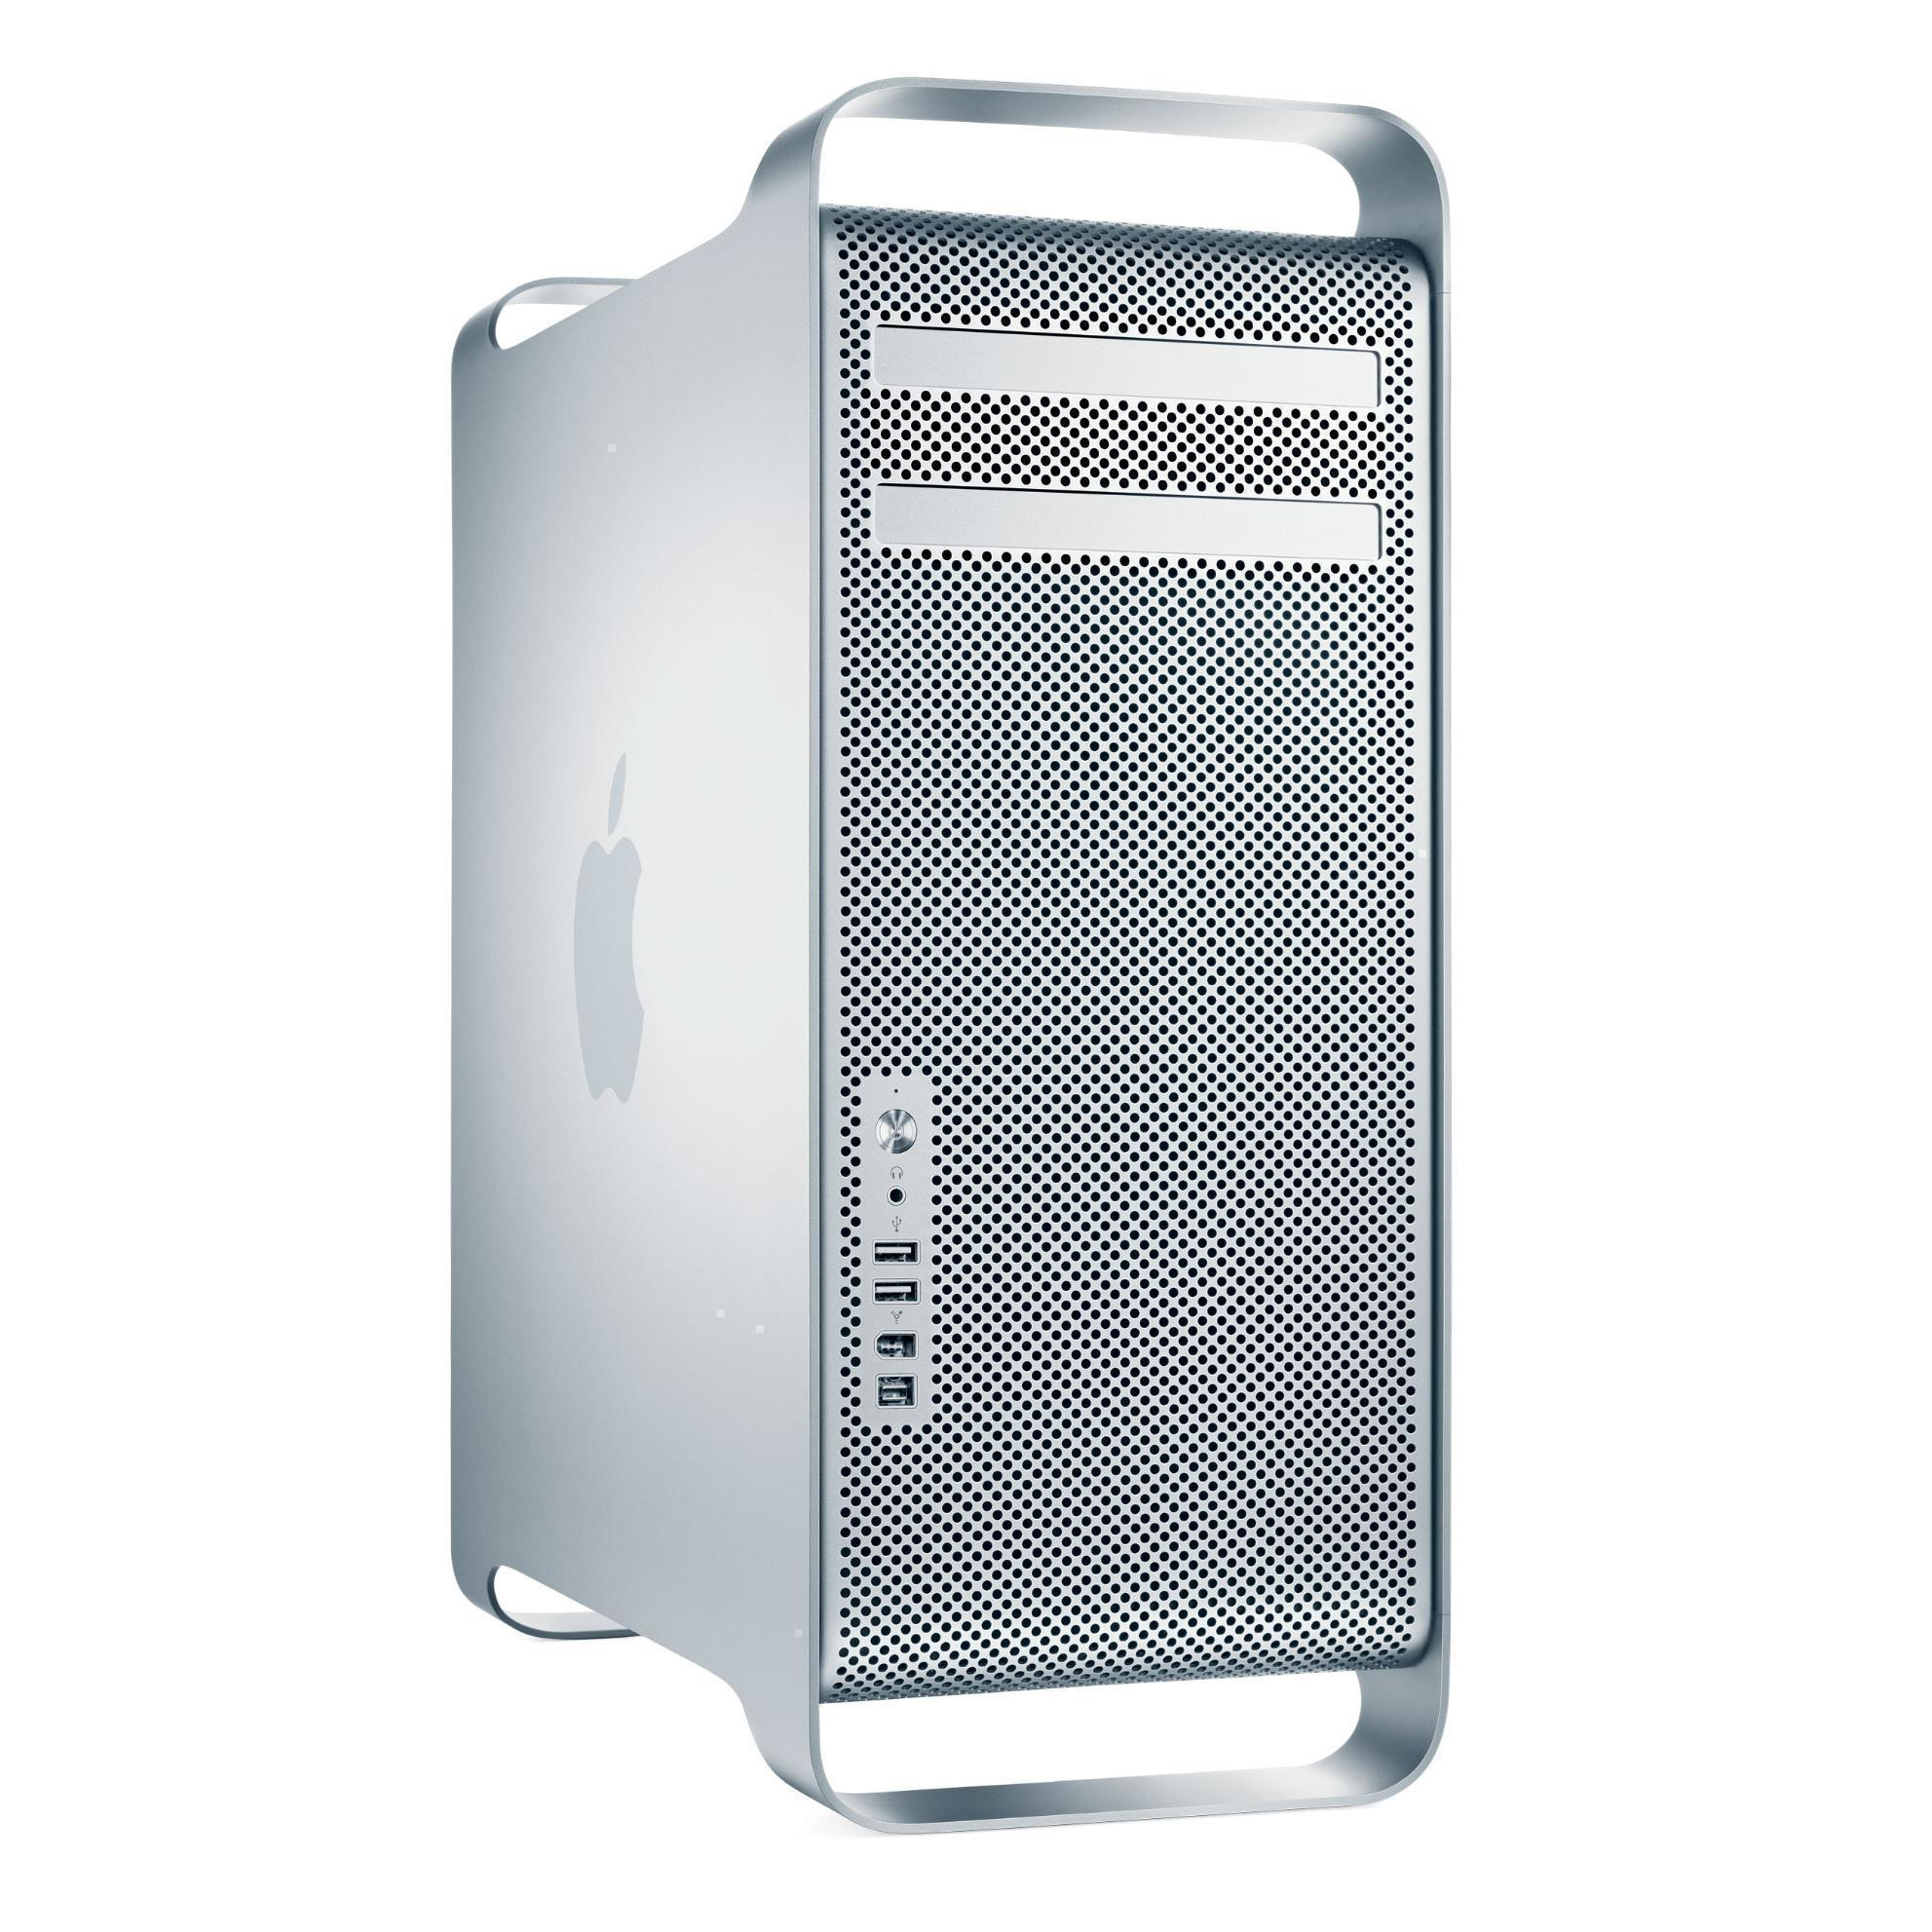 Mac Pro (Mars 2009) Xeon Quad core 2,66 GHz - SSD 250 Go + HDD 1 To - 16 Go